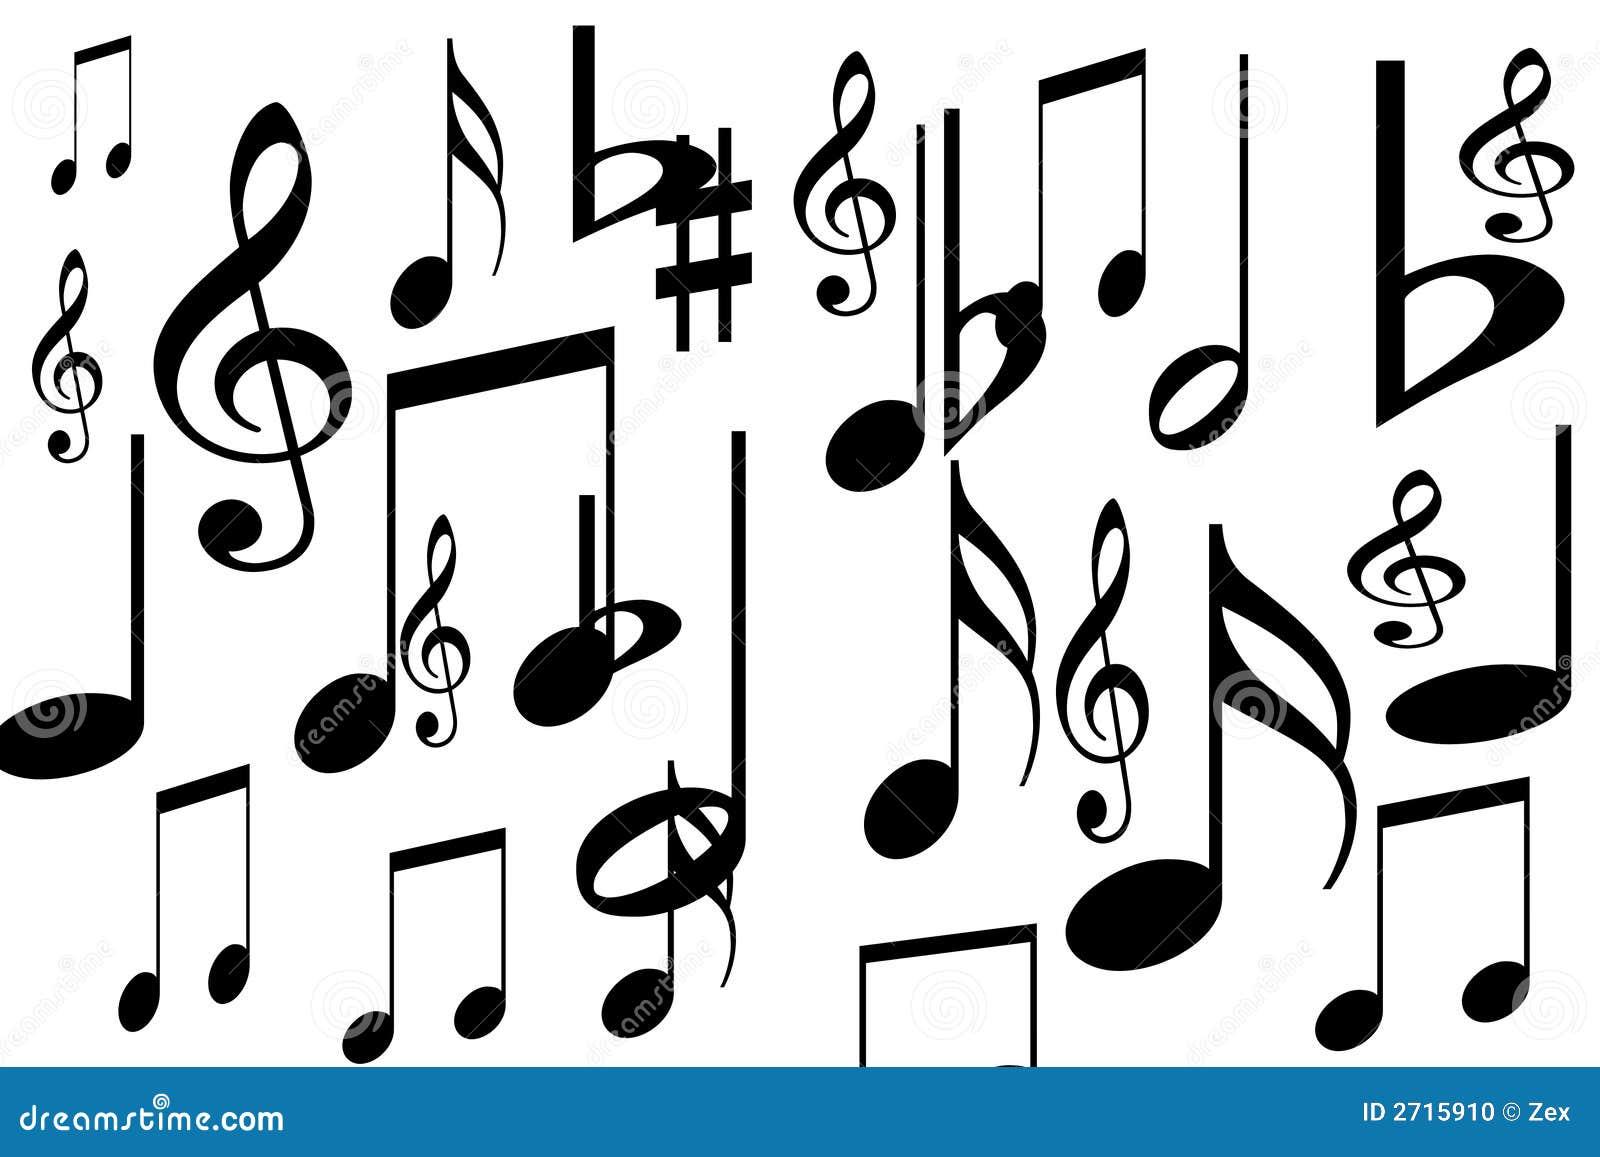 Music symbols stock illustration illustration of abstract 2715910 music symbols buycottarizona Gallery